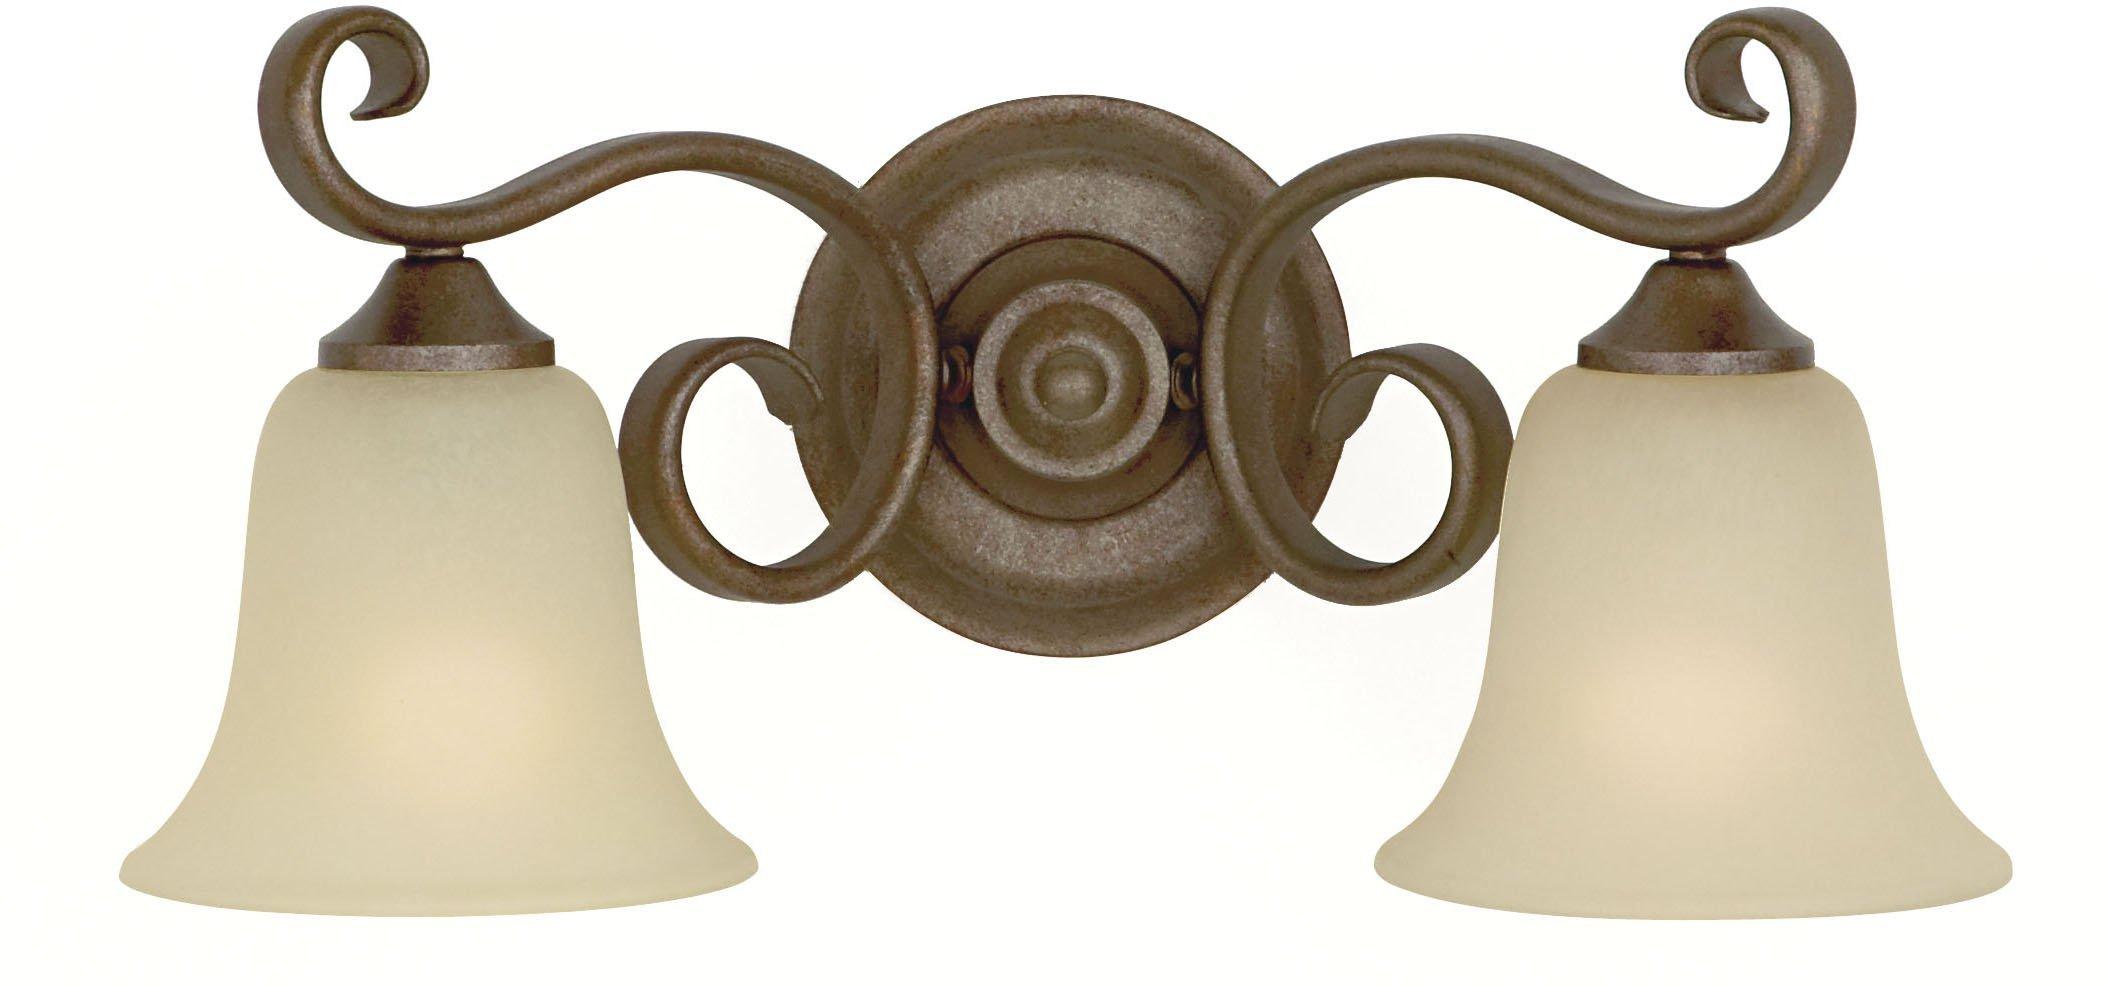 Murray Feiss VS10402-CB, Vista Vanity Fixture, 2 Light, 200 Watts, Corinthian Bronze with Cream Snow Glass Shades